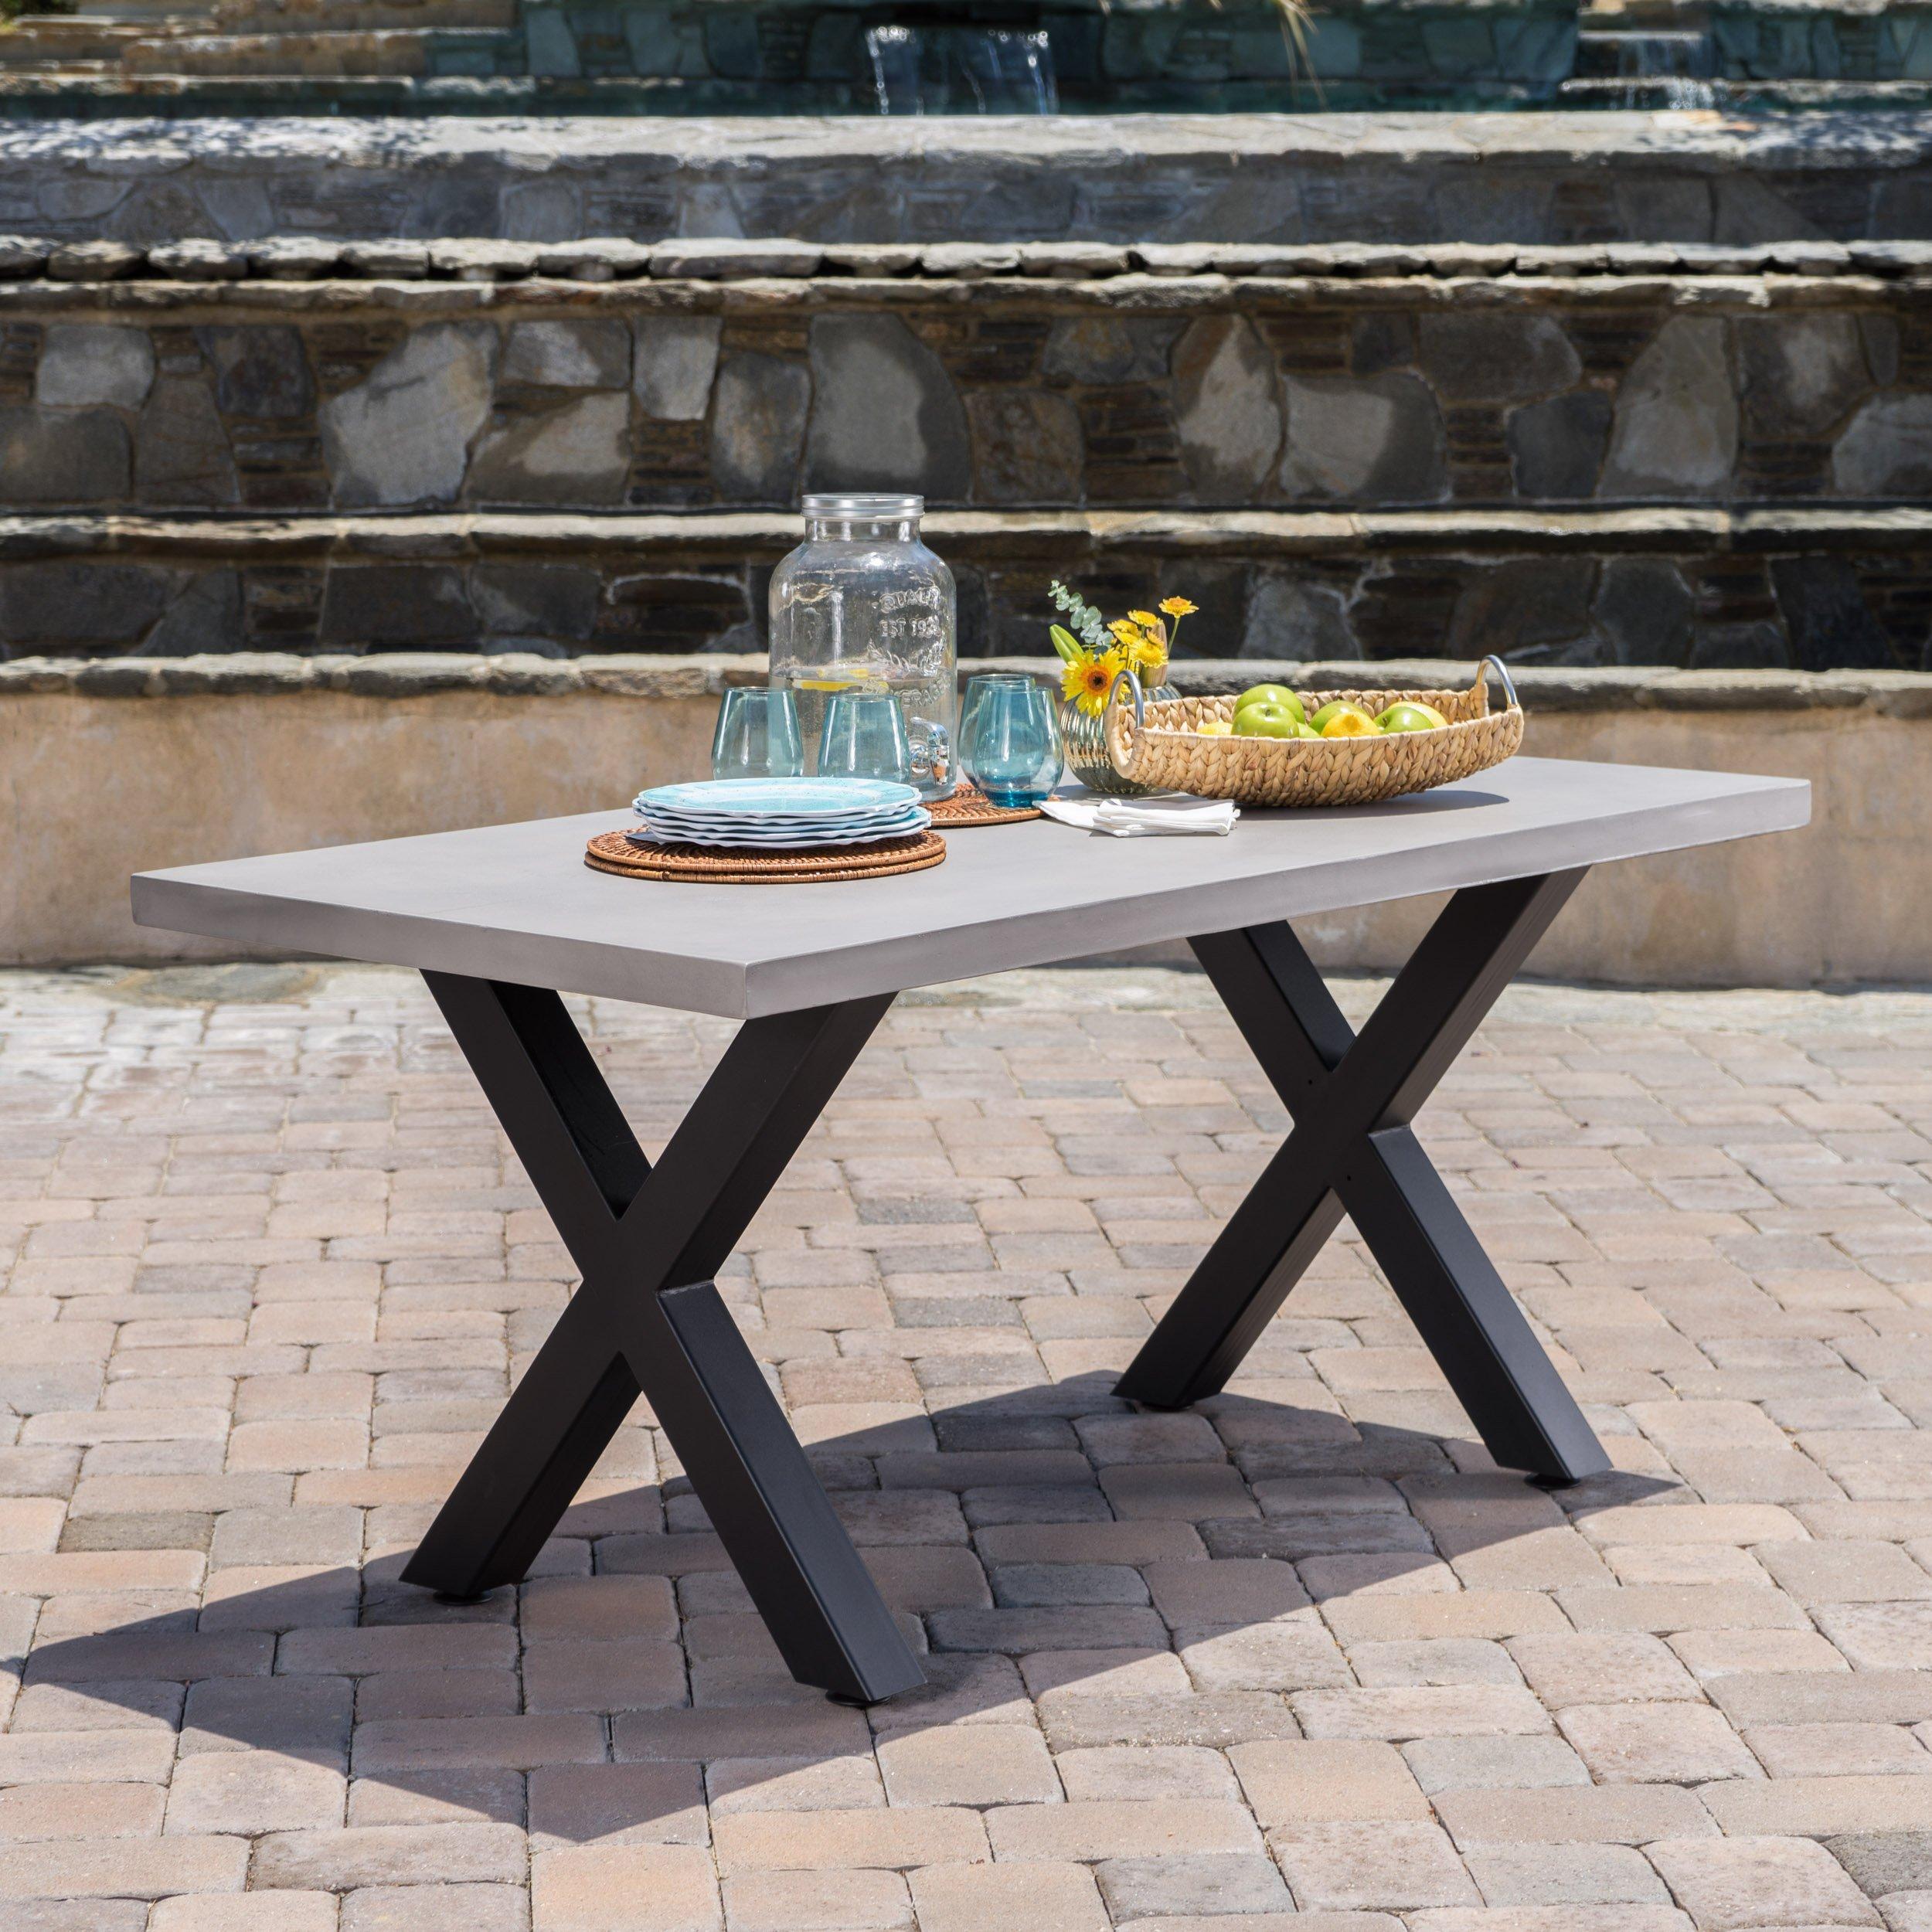 concrete patio table amazon com rh amazon com concrete patio table plans concrete patio table diy